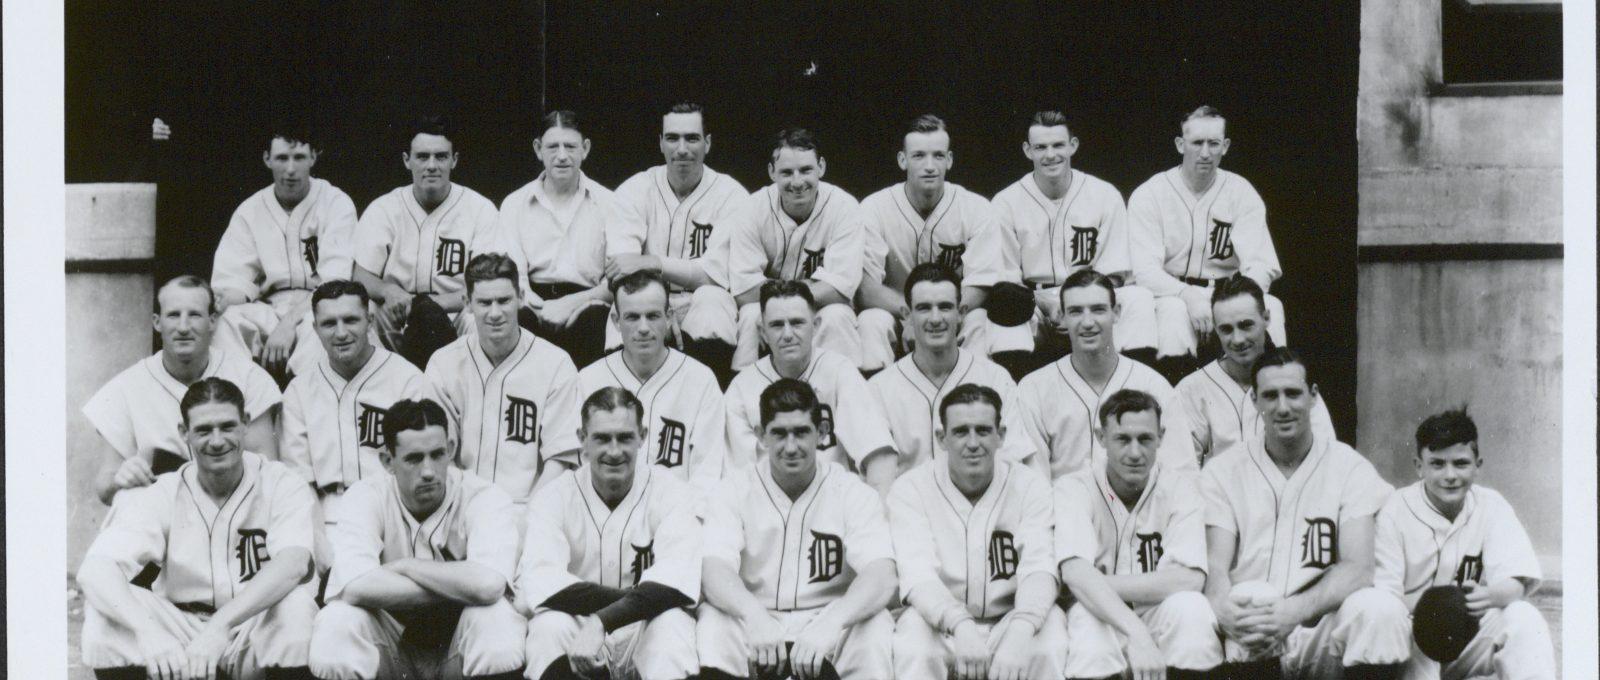 Old photo of baseball team